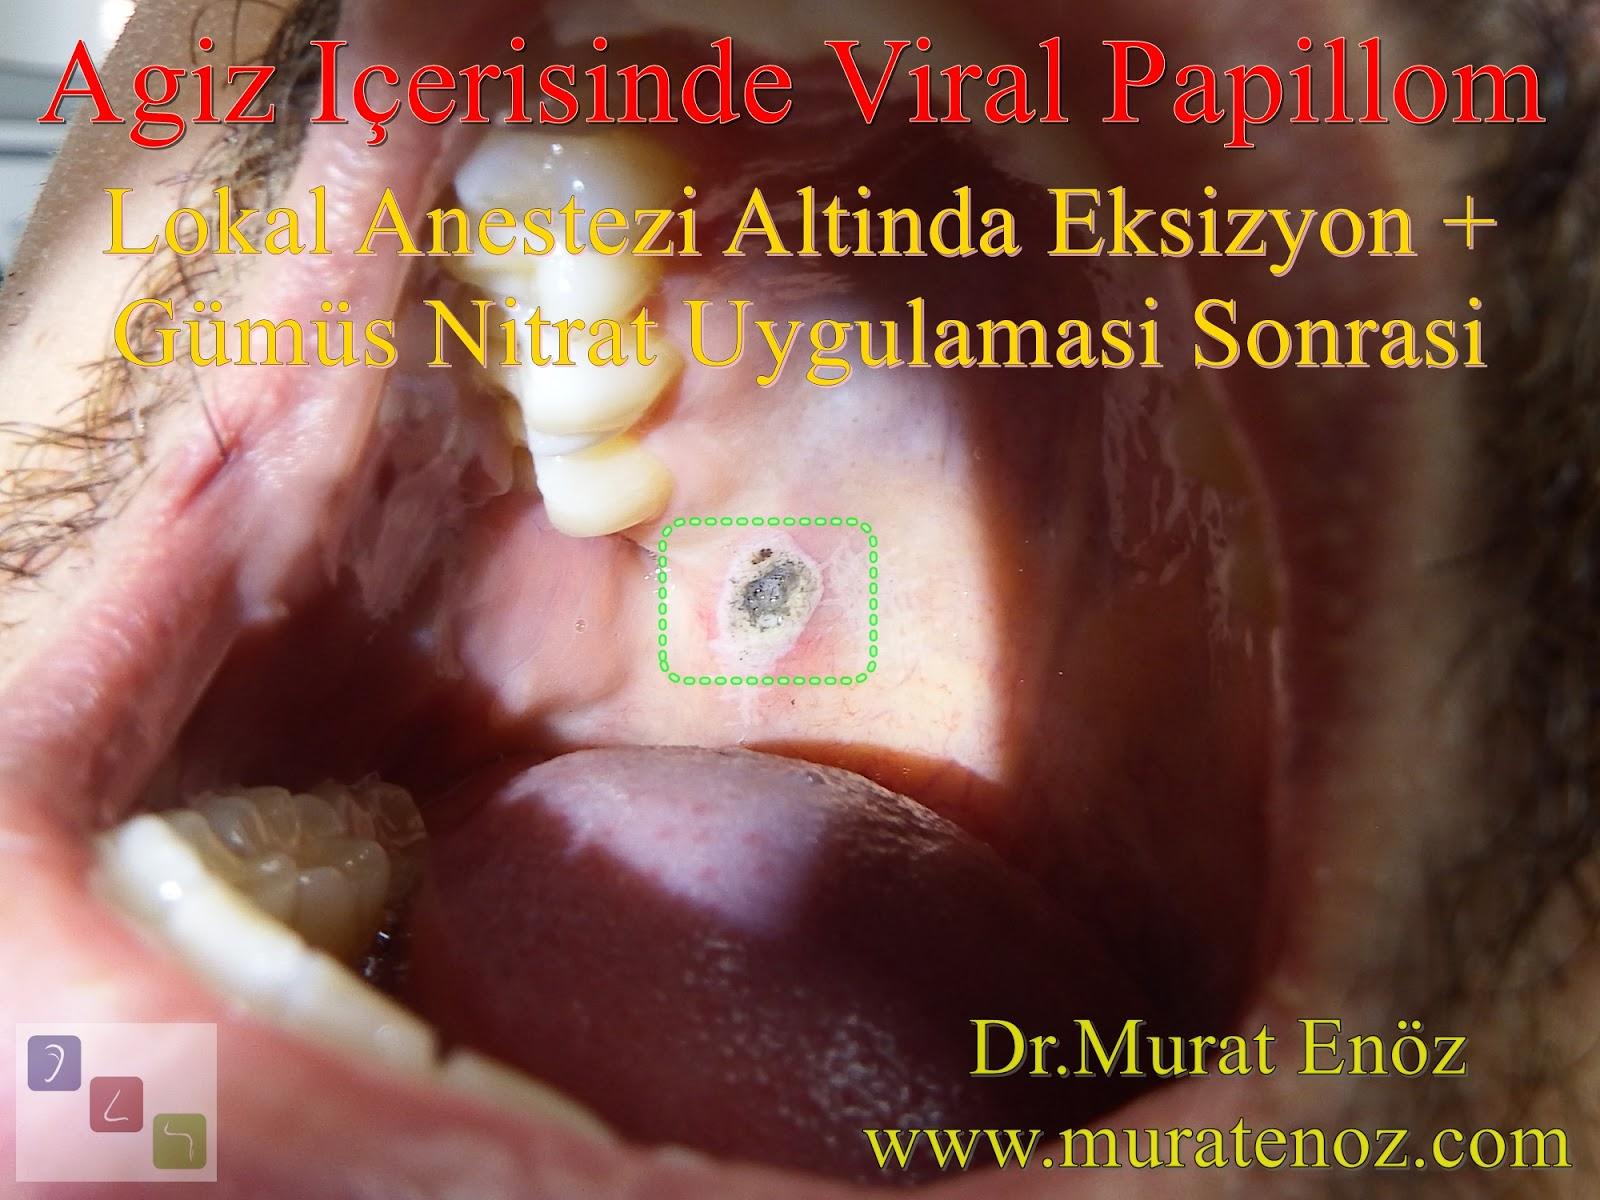 Papilloma nose treatment - csrb.ro, Papilloma sinus cancer